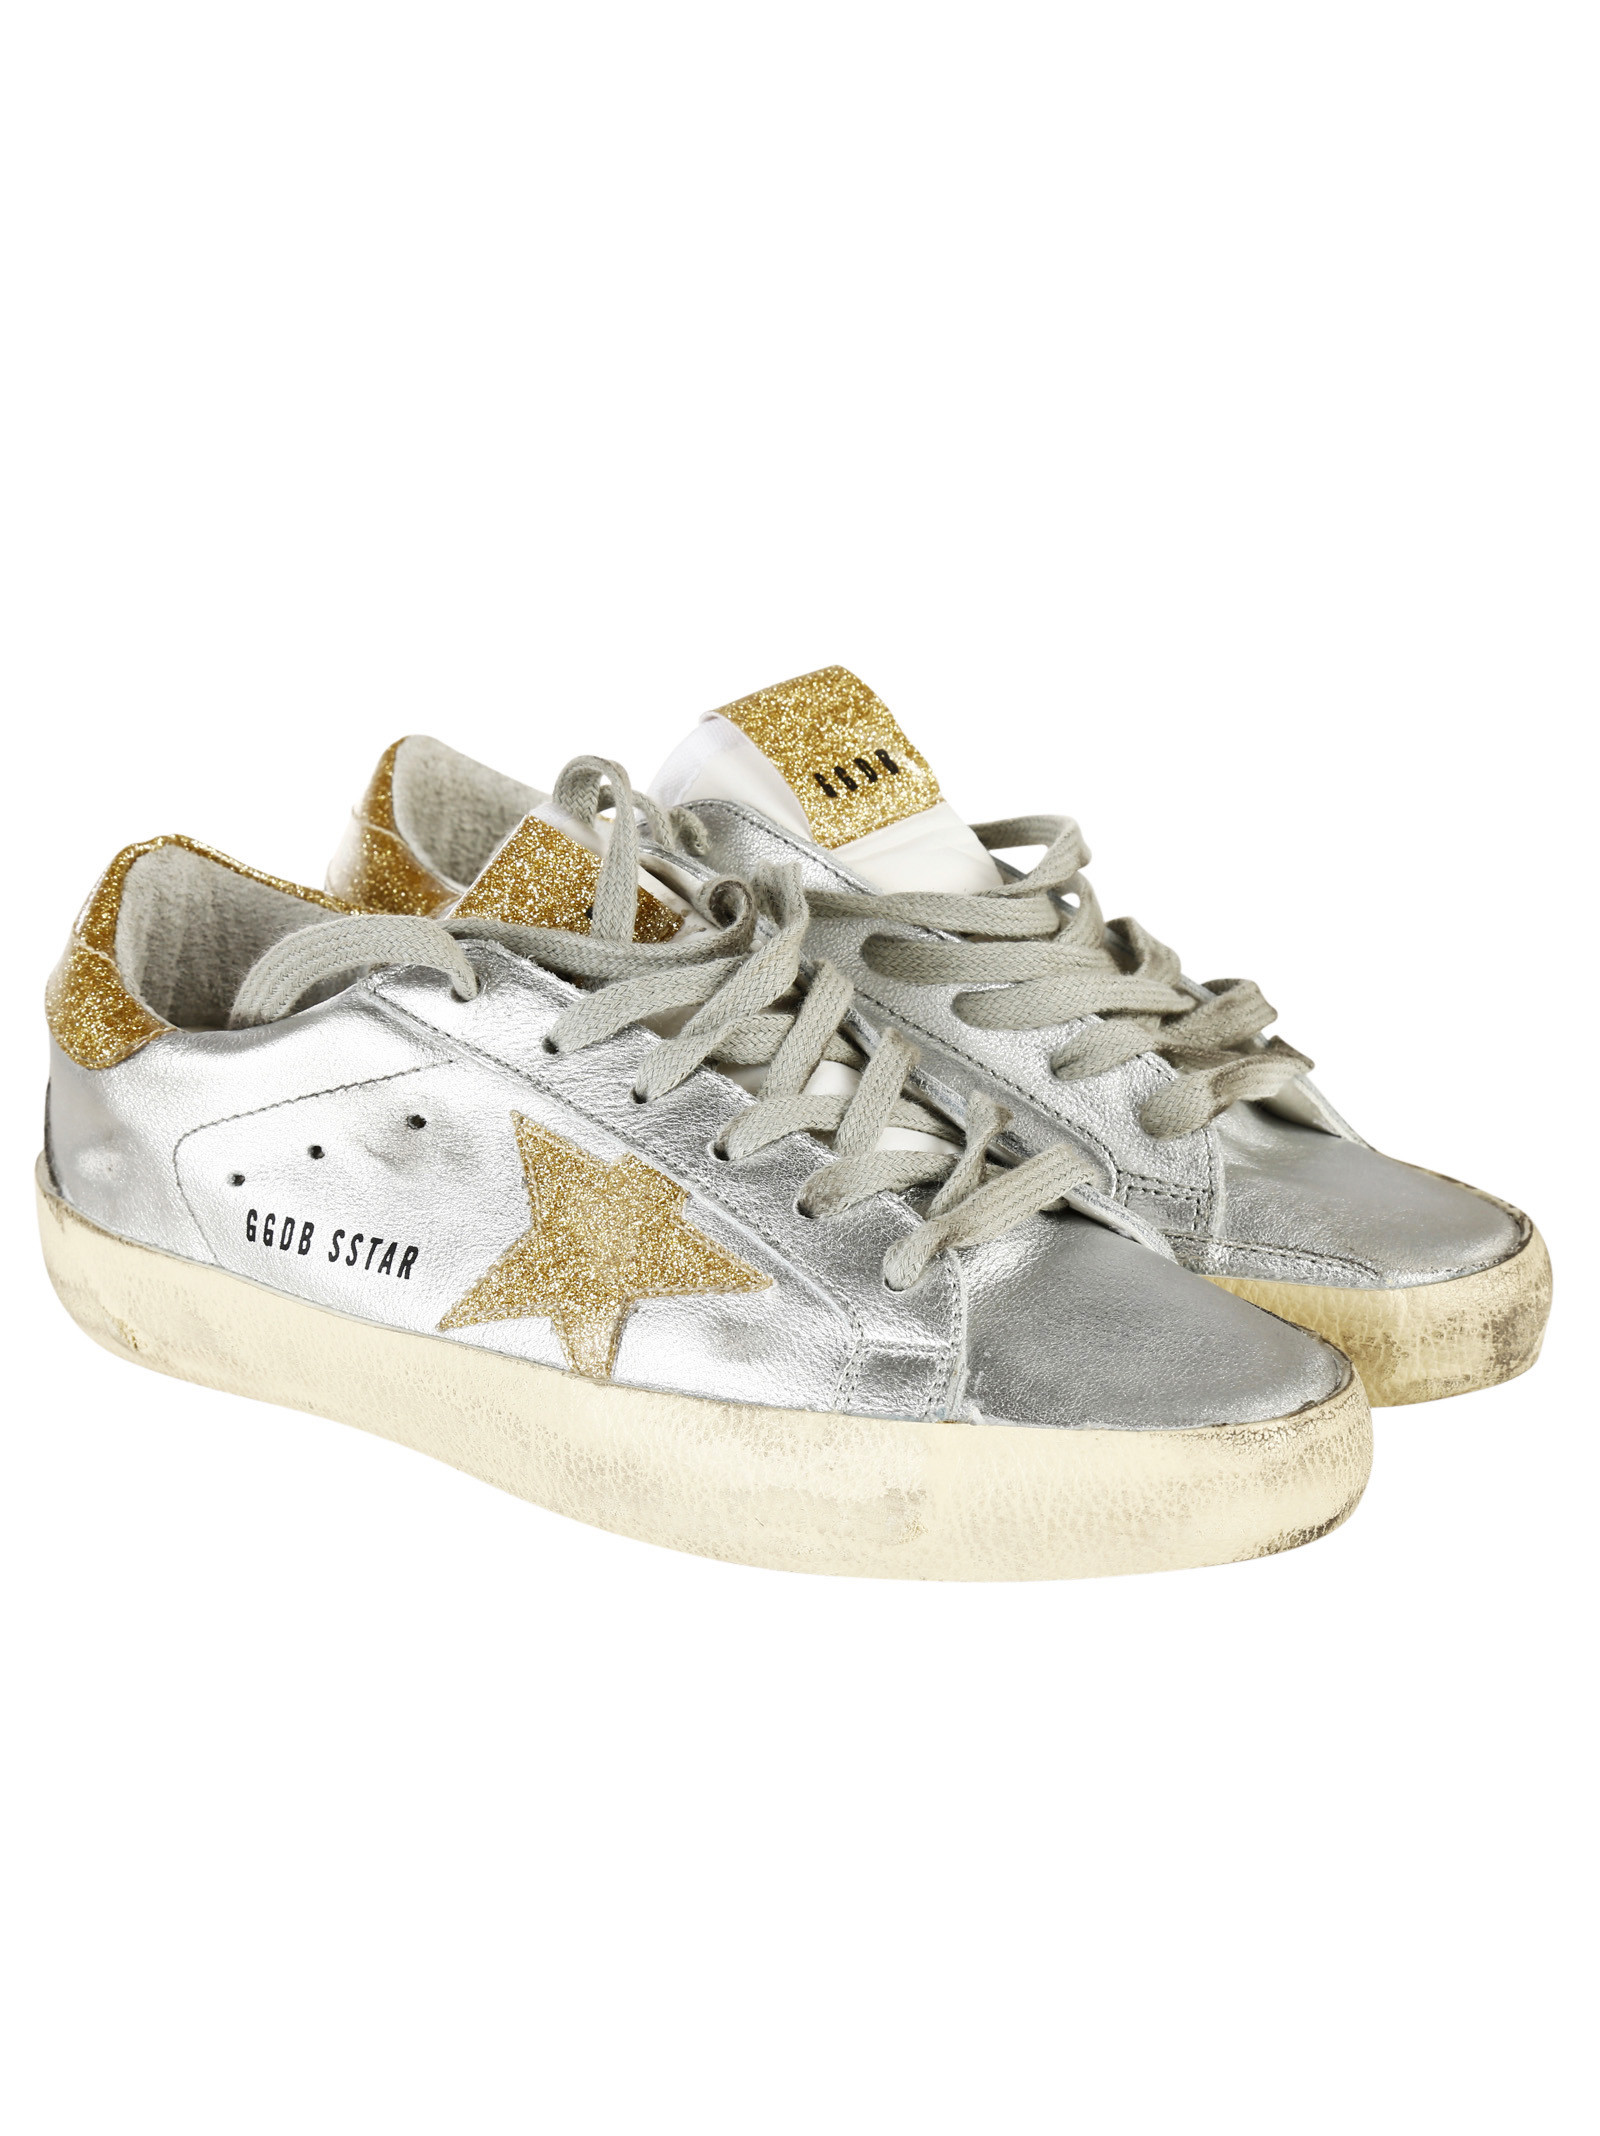 golden goose golden goose super star sneakers g27d121 a26 women 39 s sneakers italist. Black Bedroom Furniture Sets. Home Design Ideas